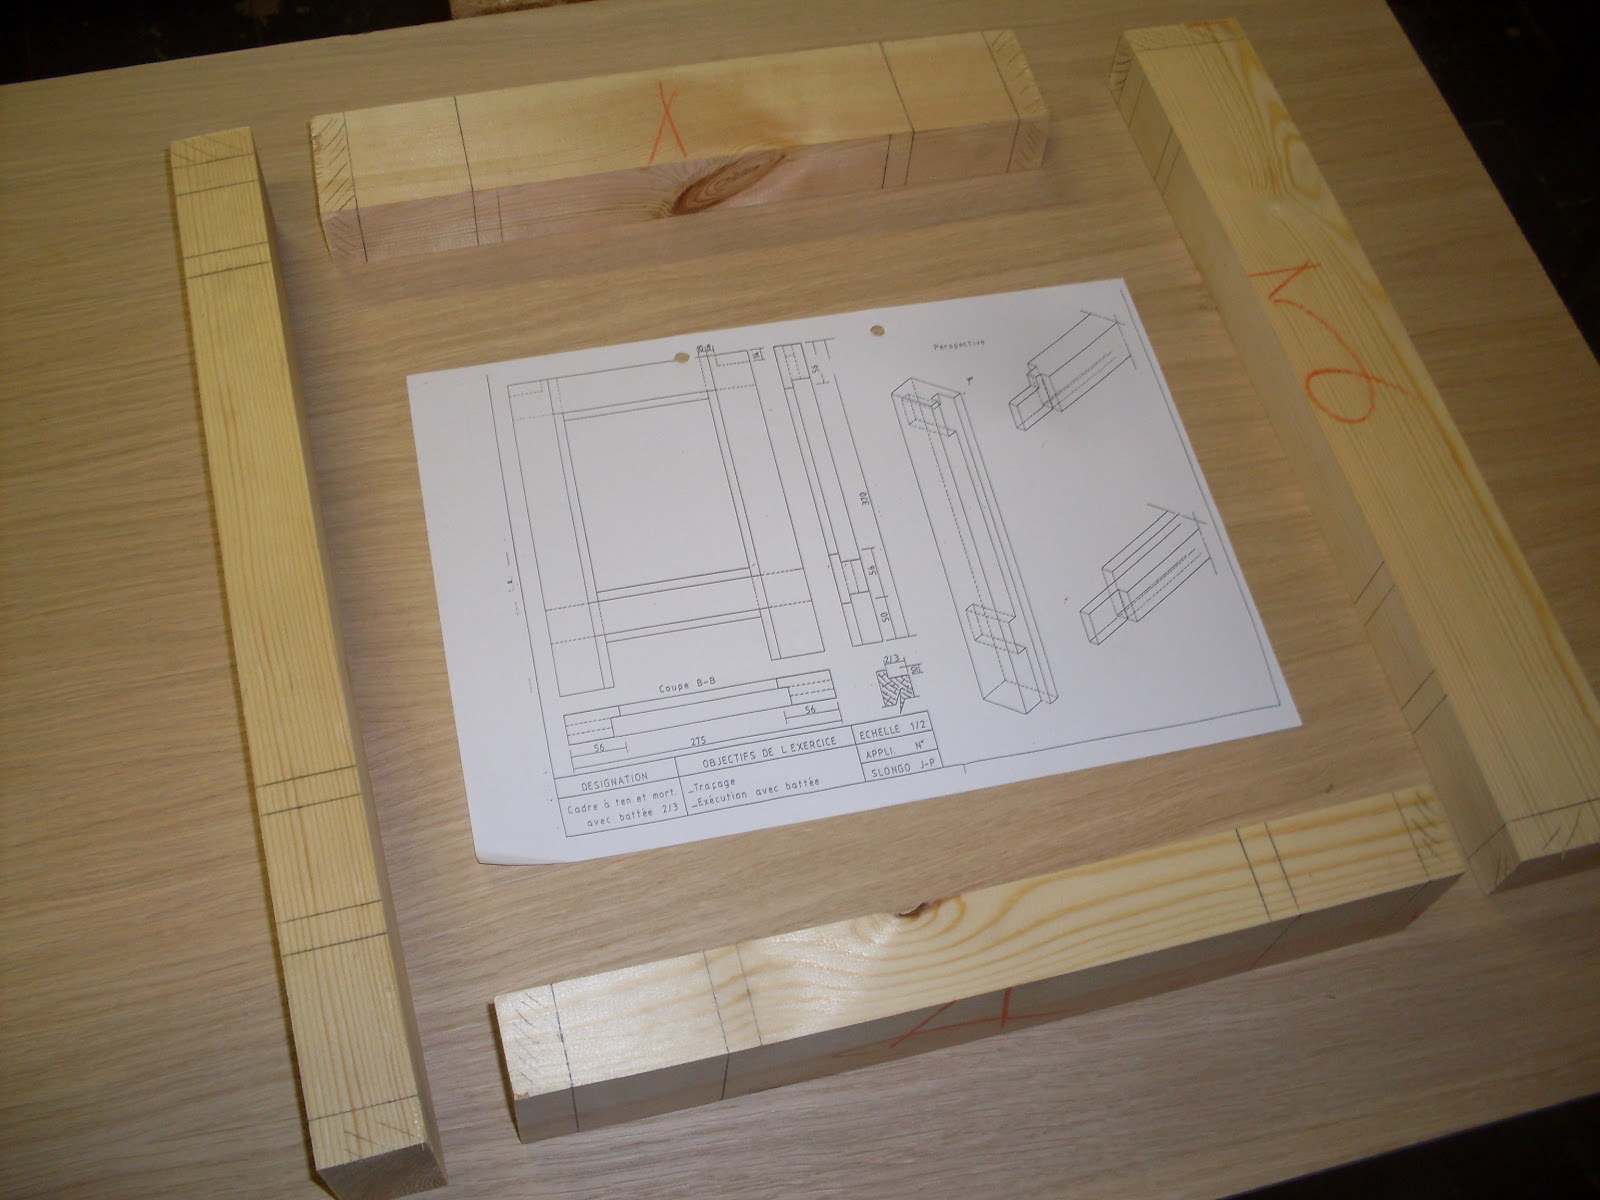 menuiserie assemblage avec batt e 2 3. Black Bedroom Furniture Sets. Home Design Ideas